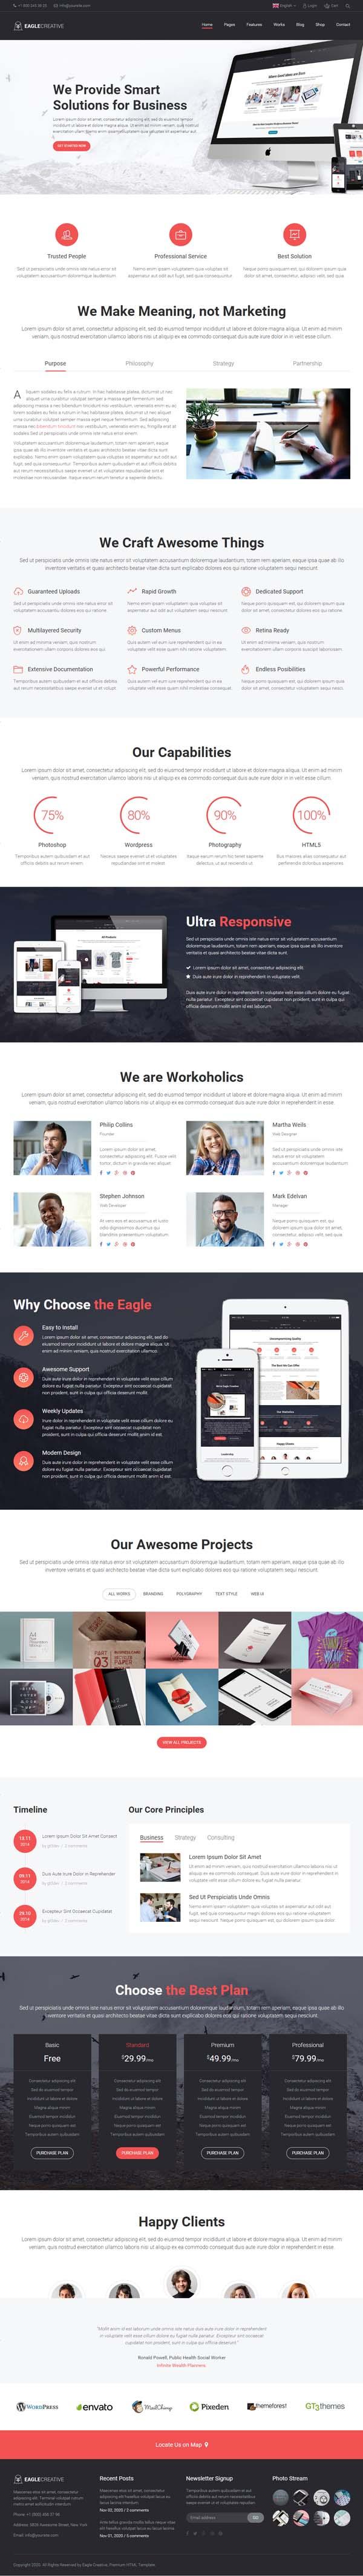 Eagle - Creative Business Website Template